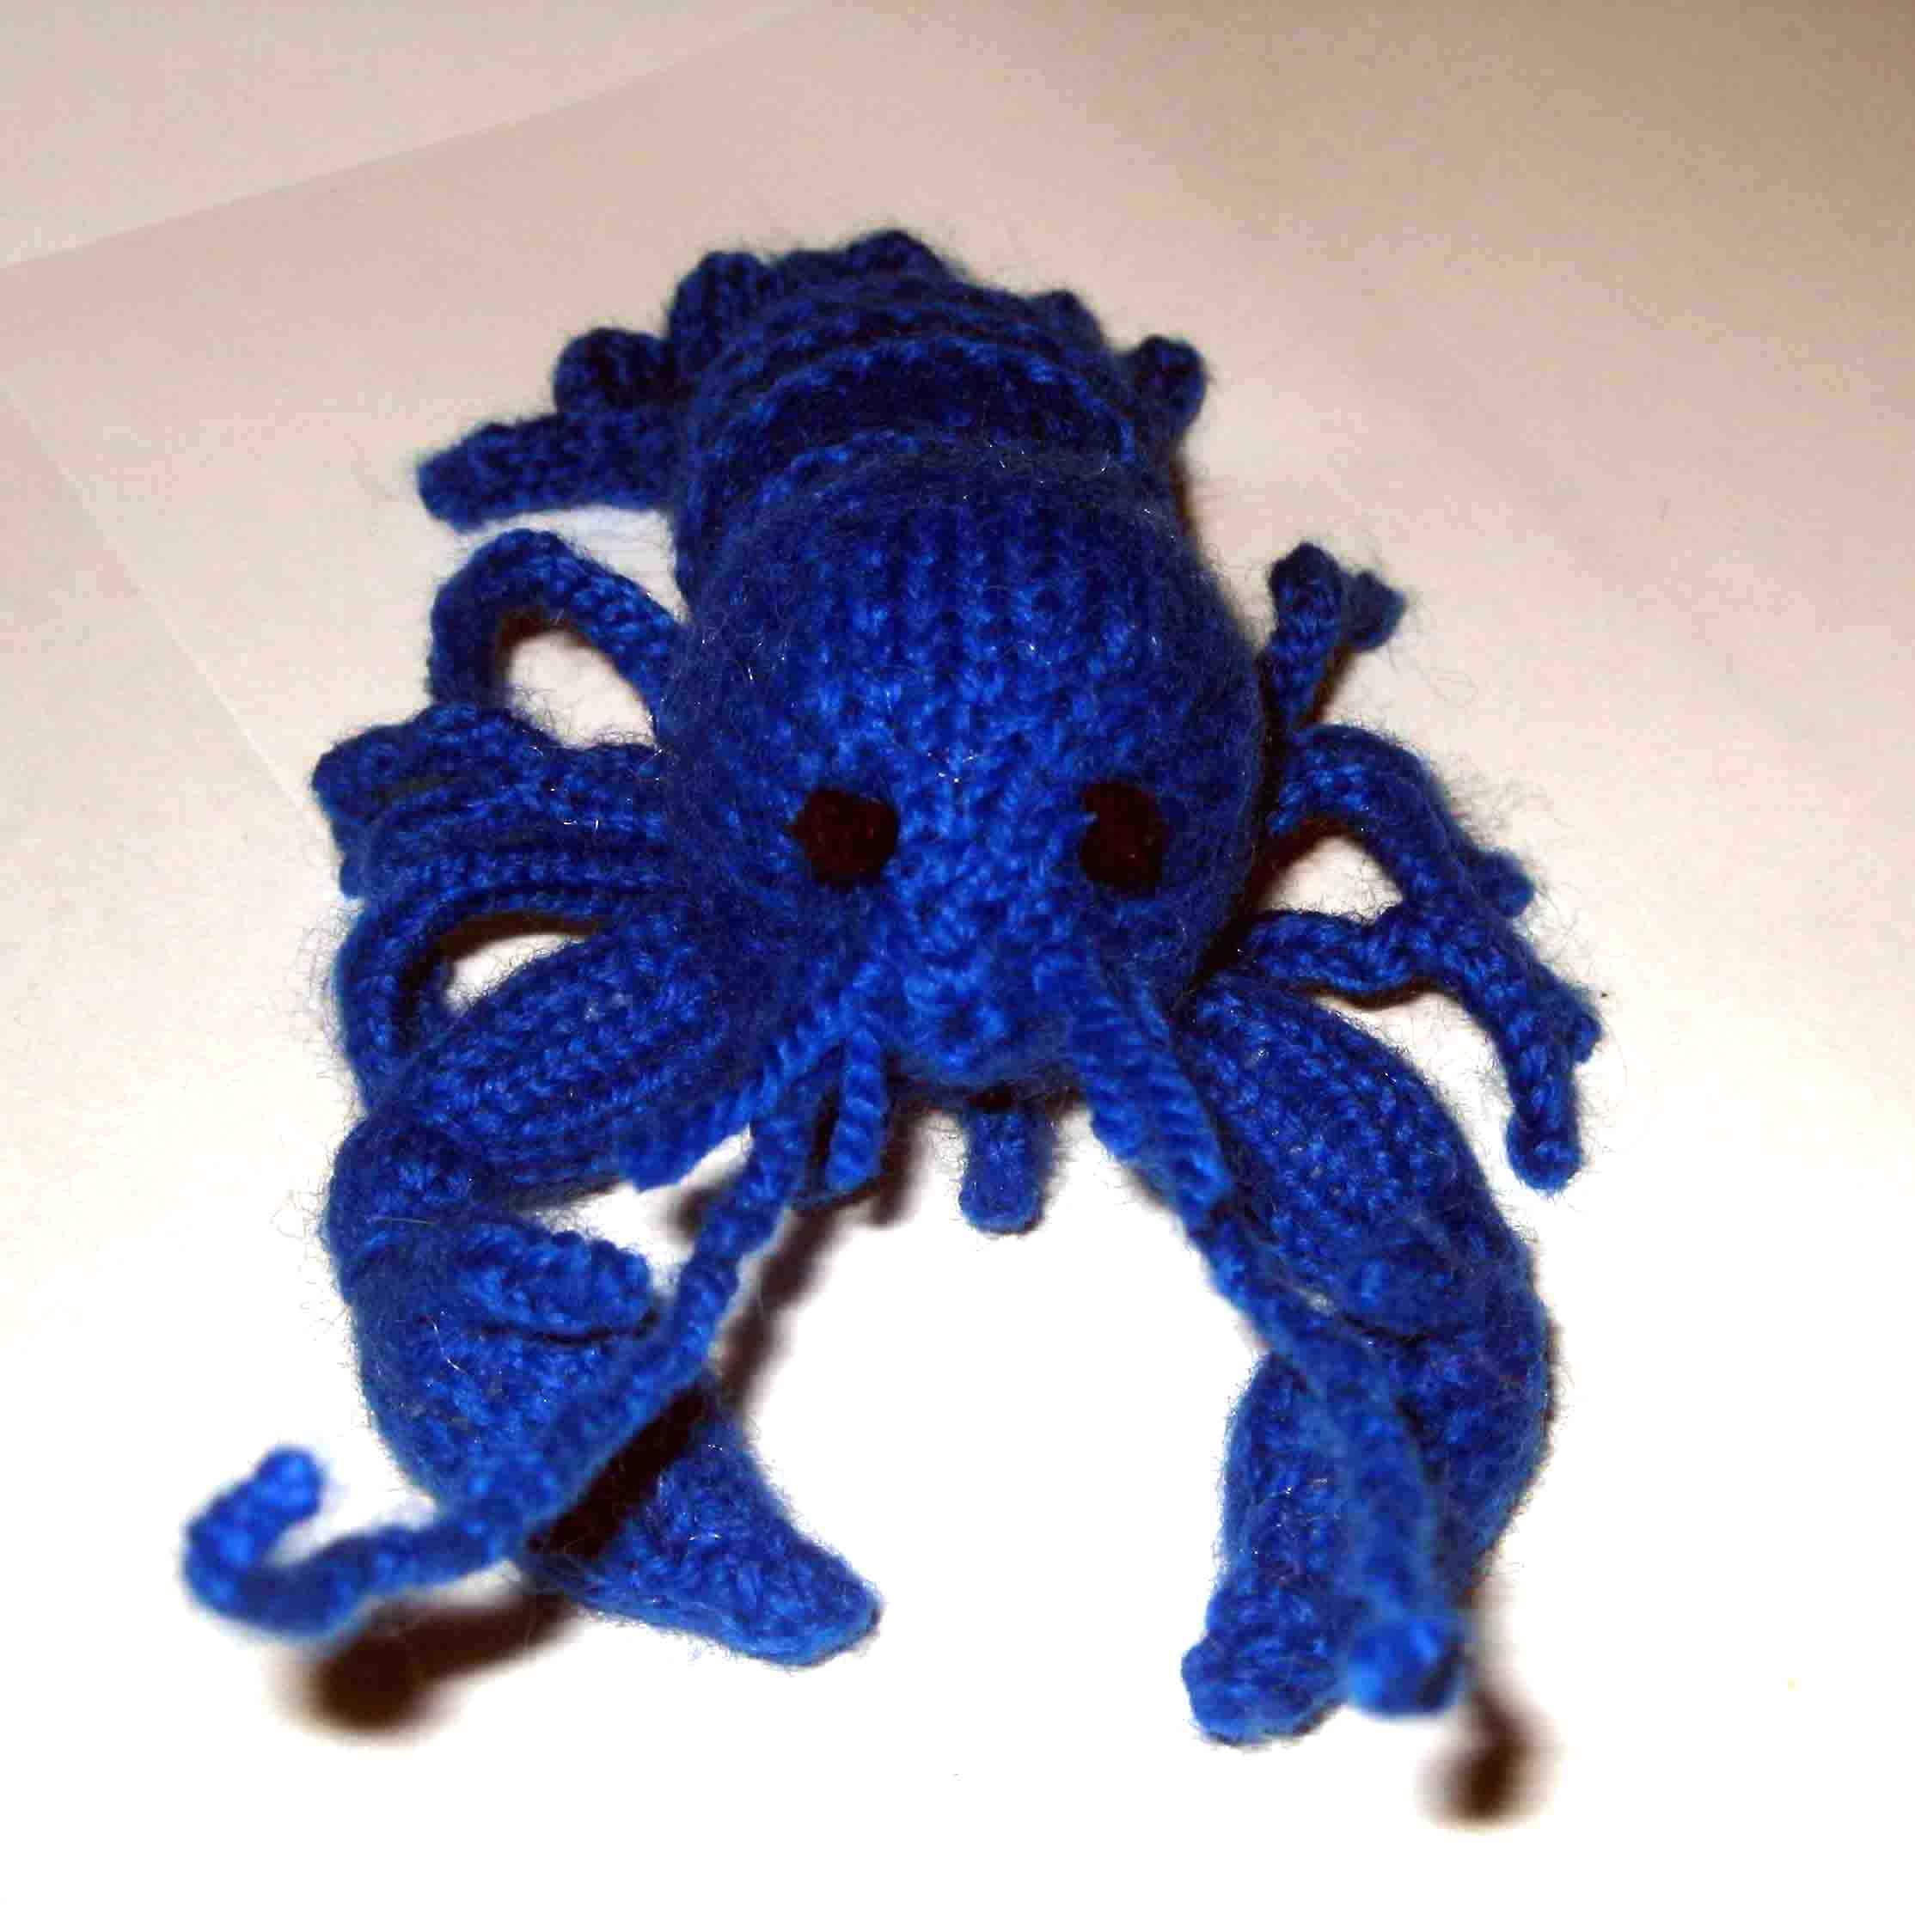 Knitting: Blue Crayfish | Random Bits of Projects